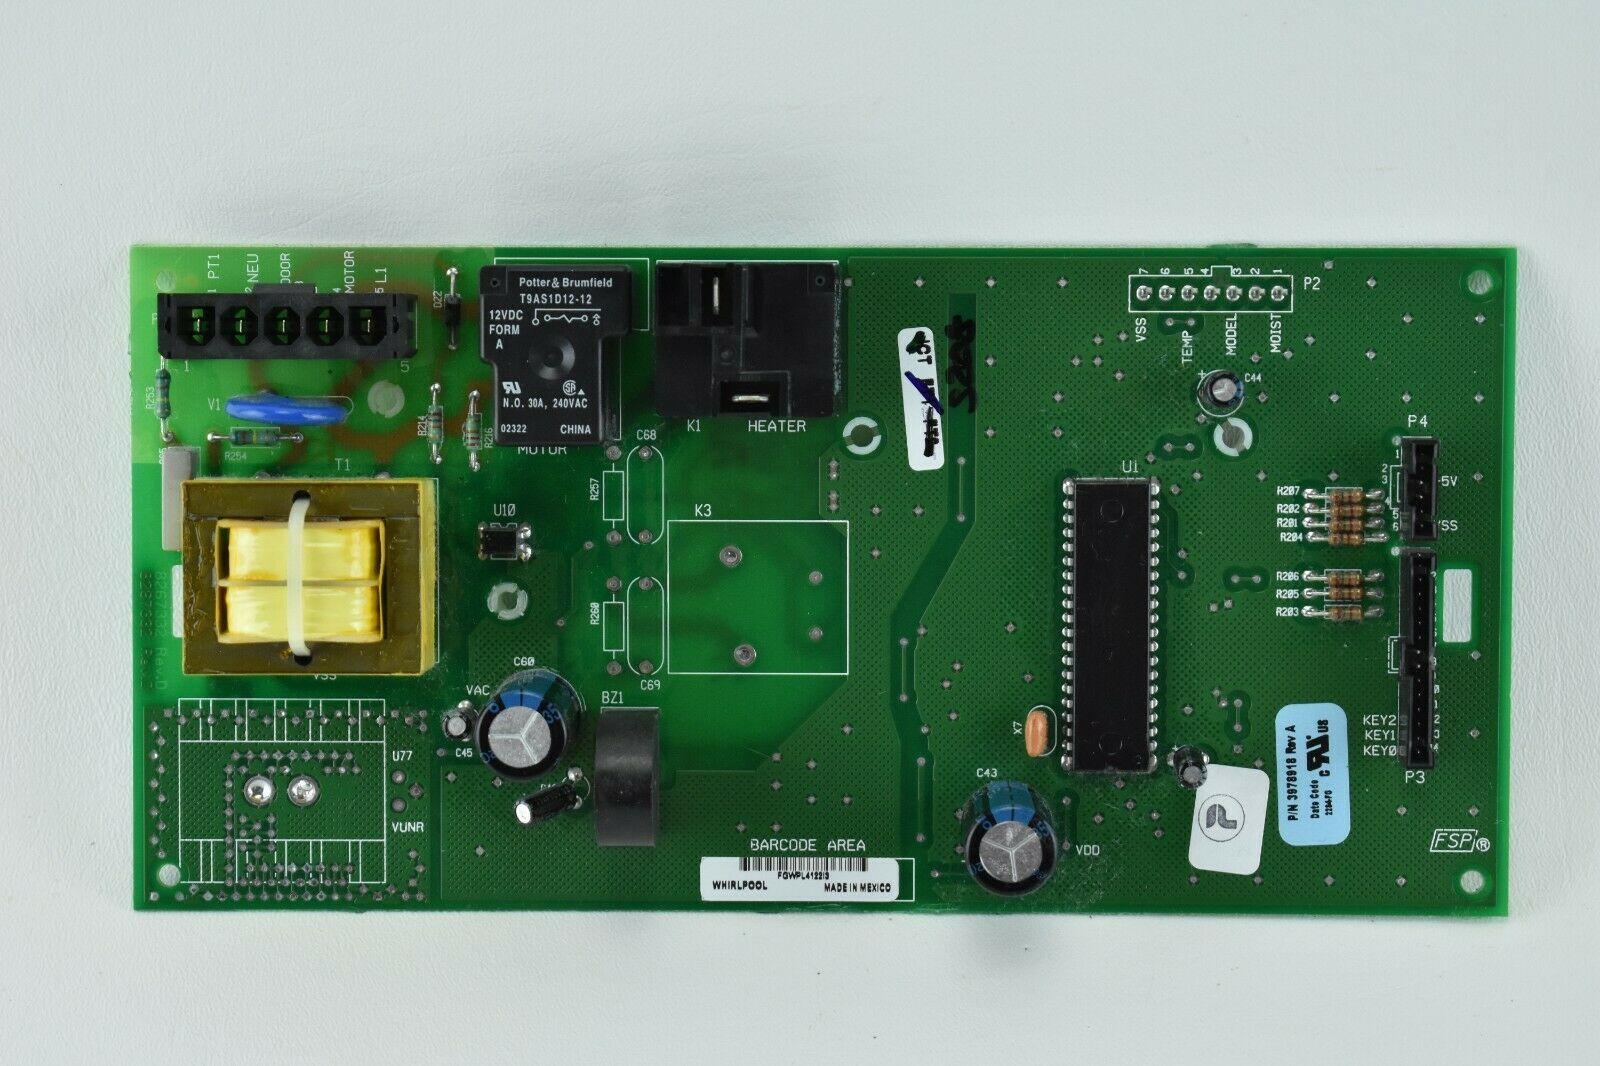 Genuine WHIRLPOOL Dryer, Control Board # 3978918